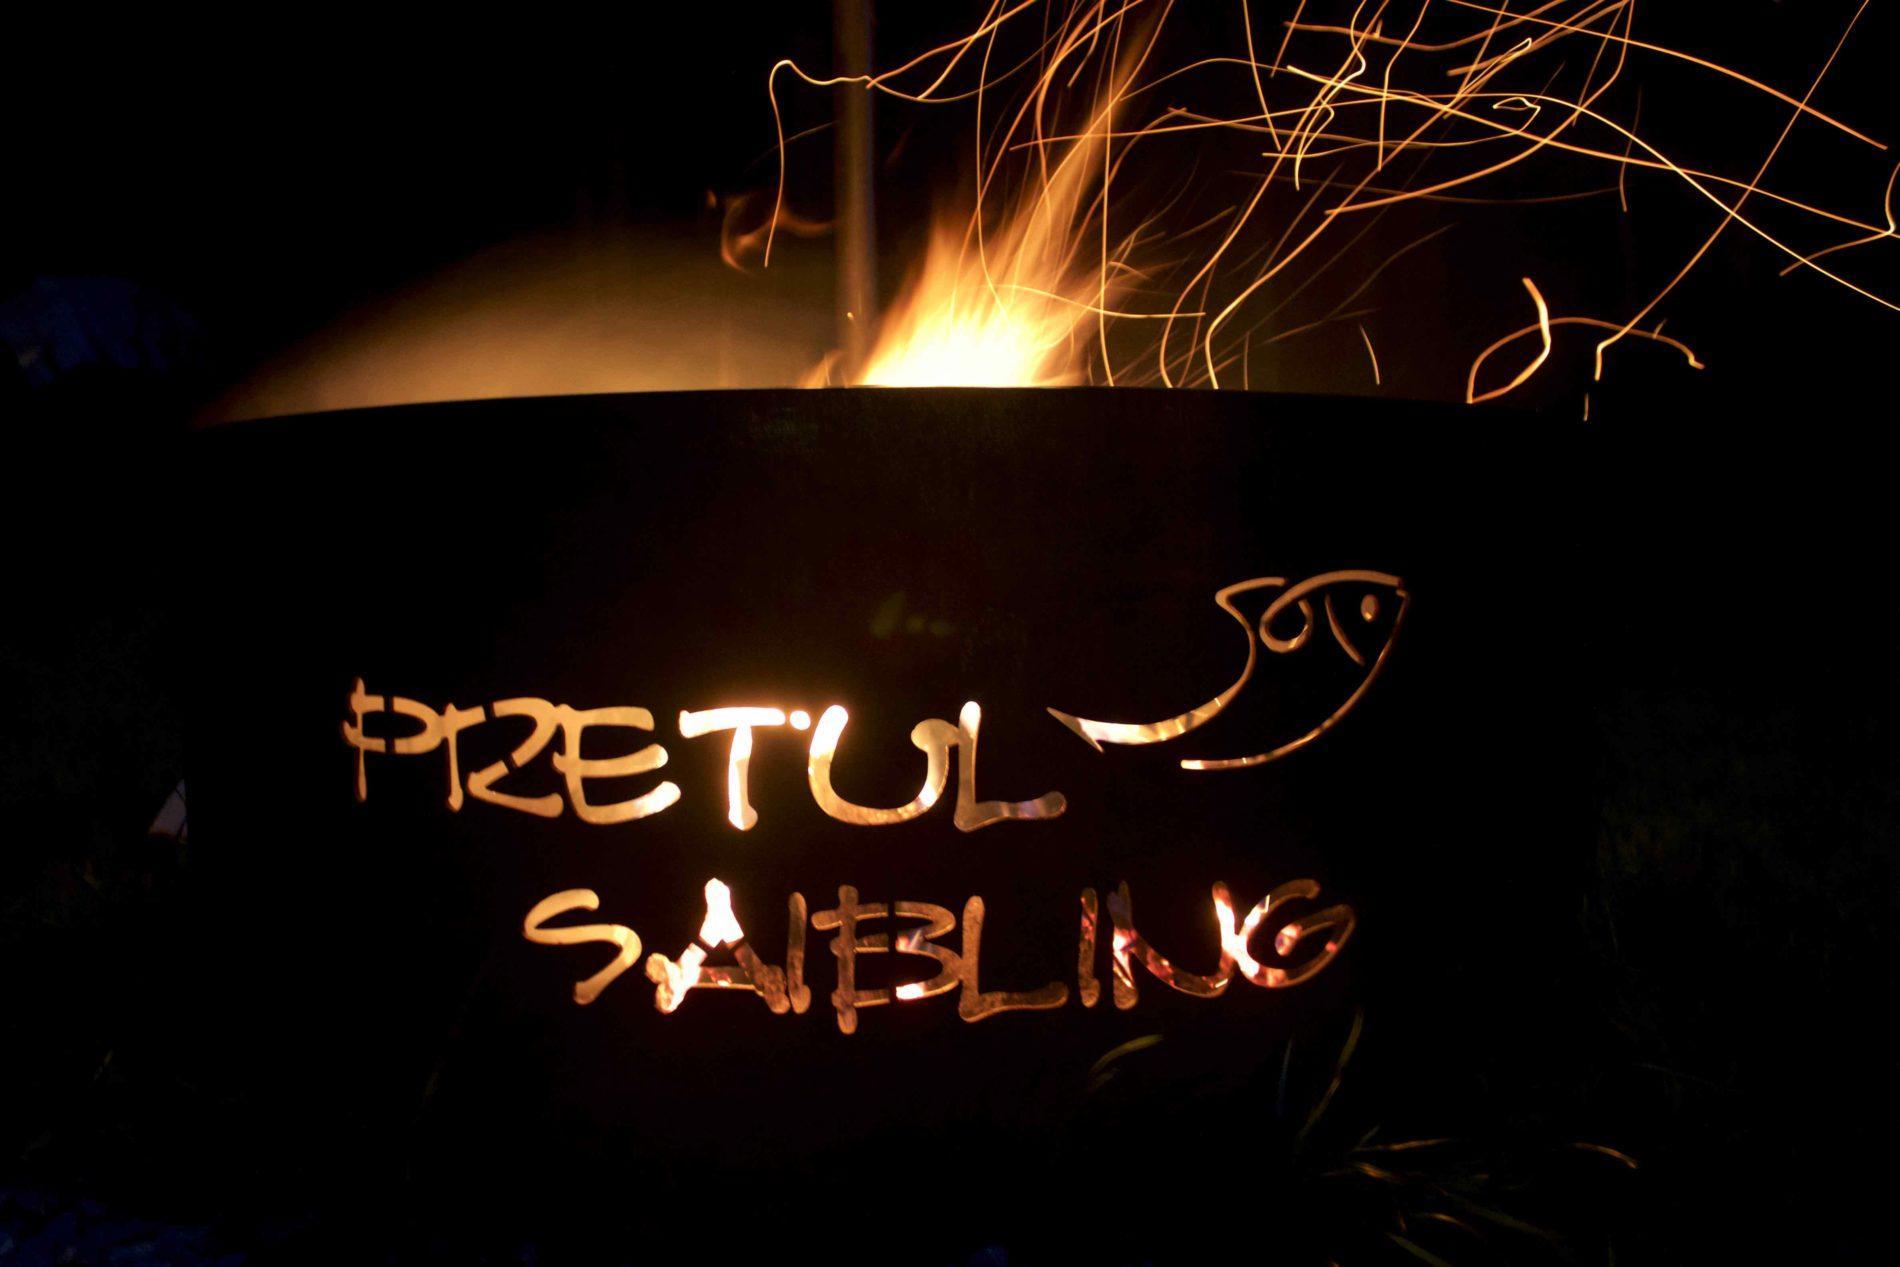 Pretul-Saibling-Feuer